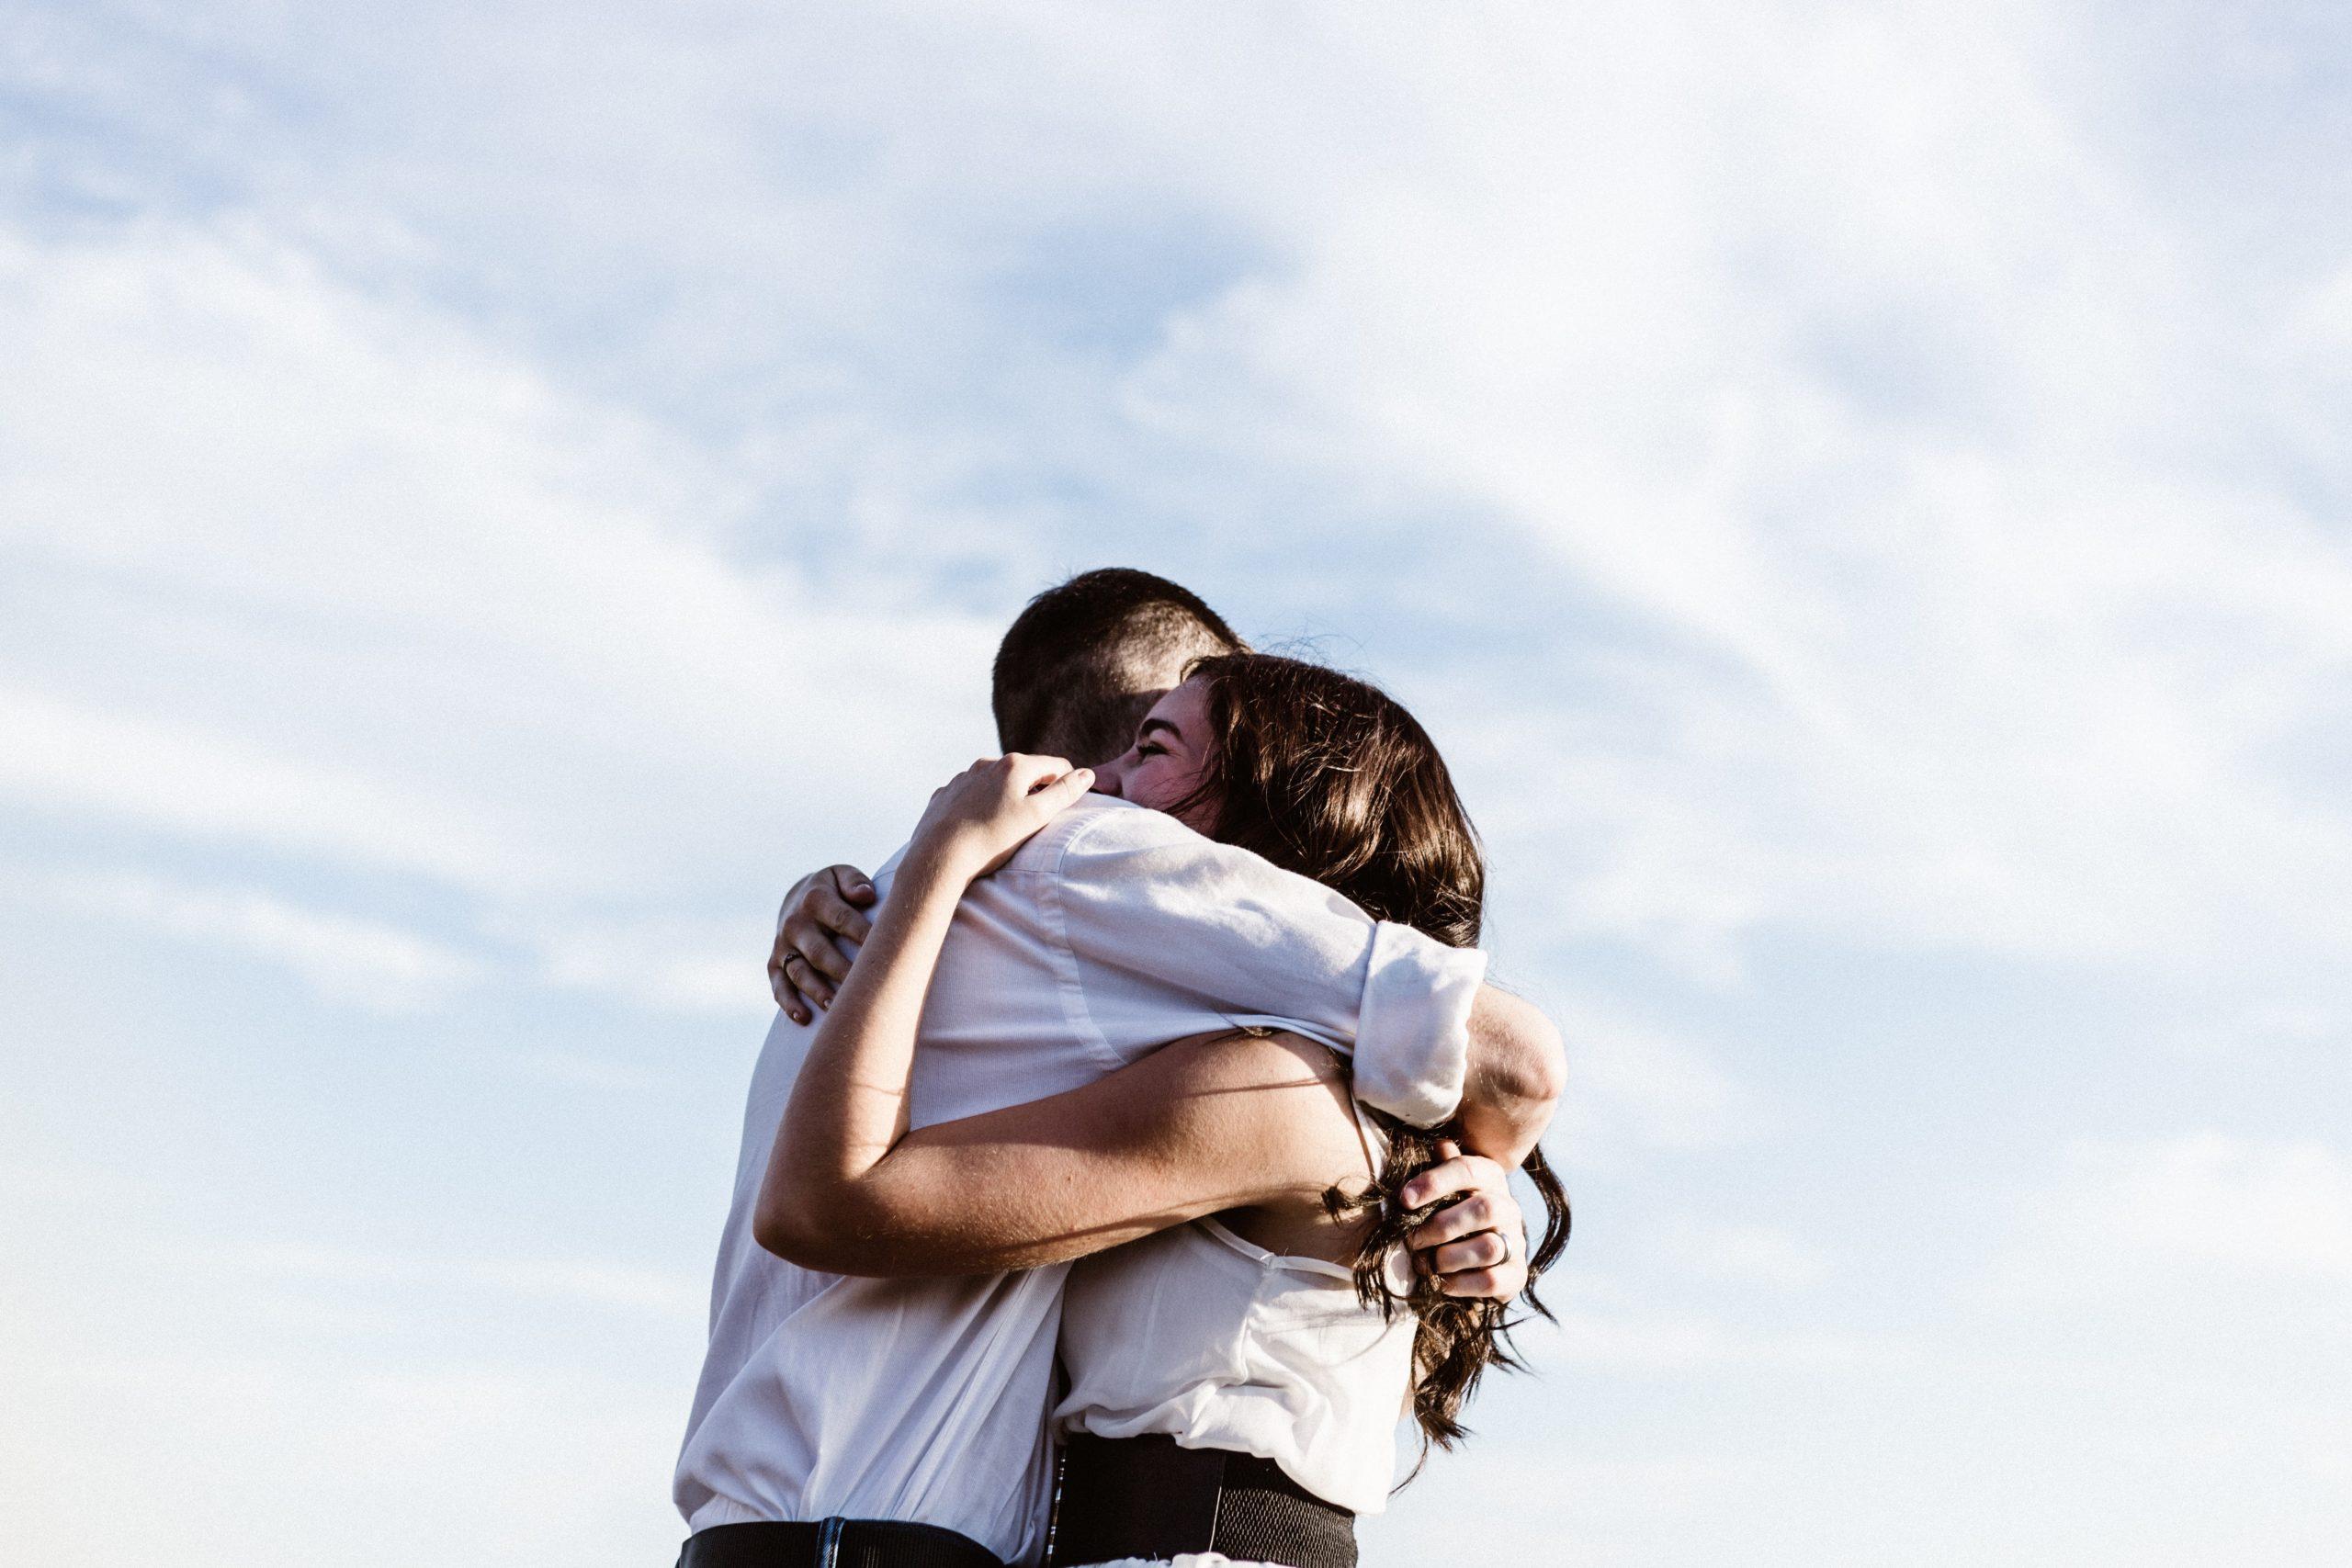 healthy living,relationship advice,Needy,partners,Relationships,healthy relationships,Love and Relationships,Conscious Relationships